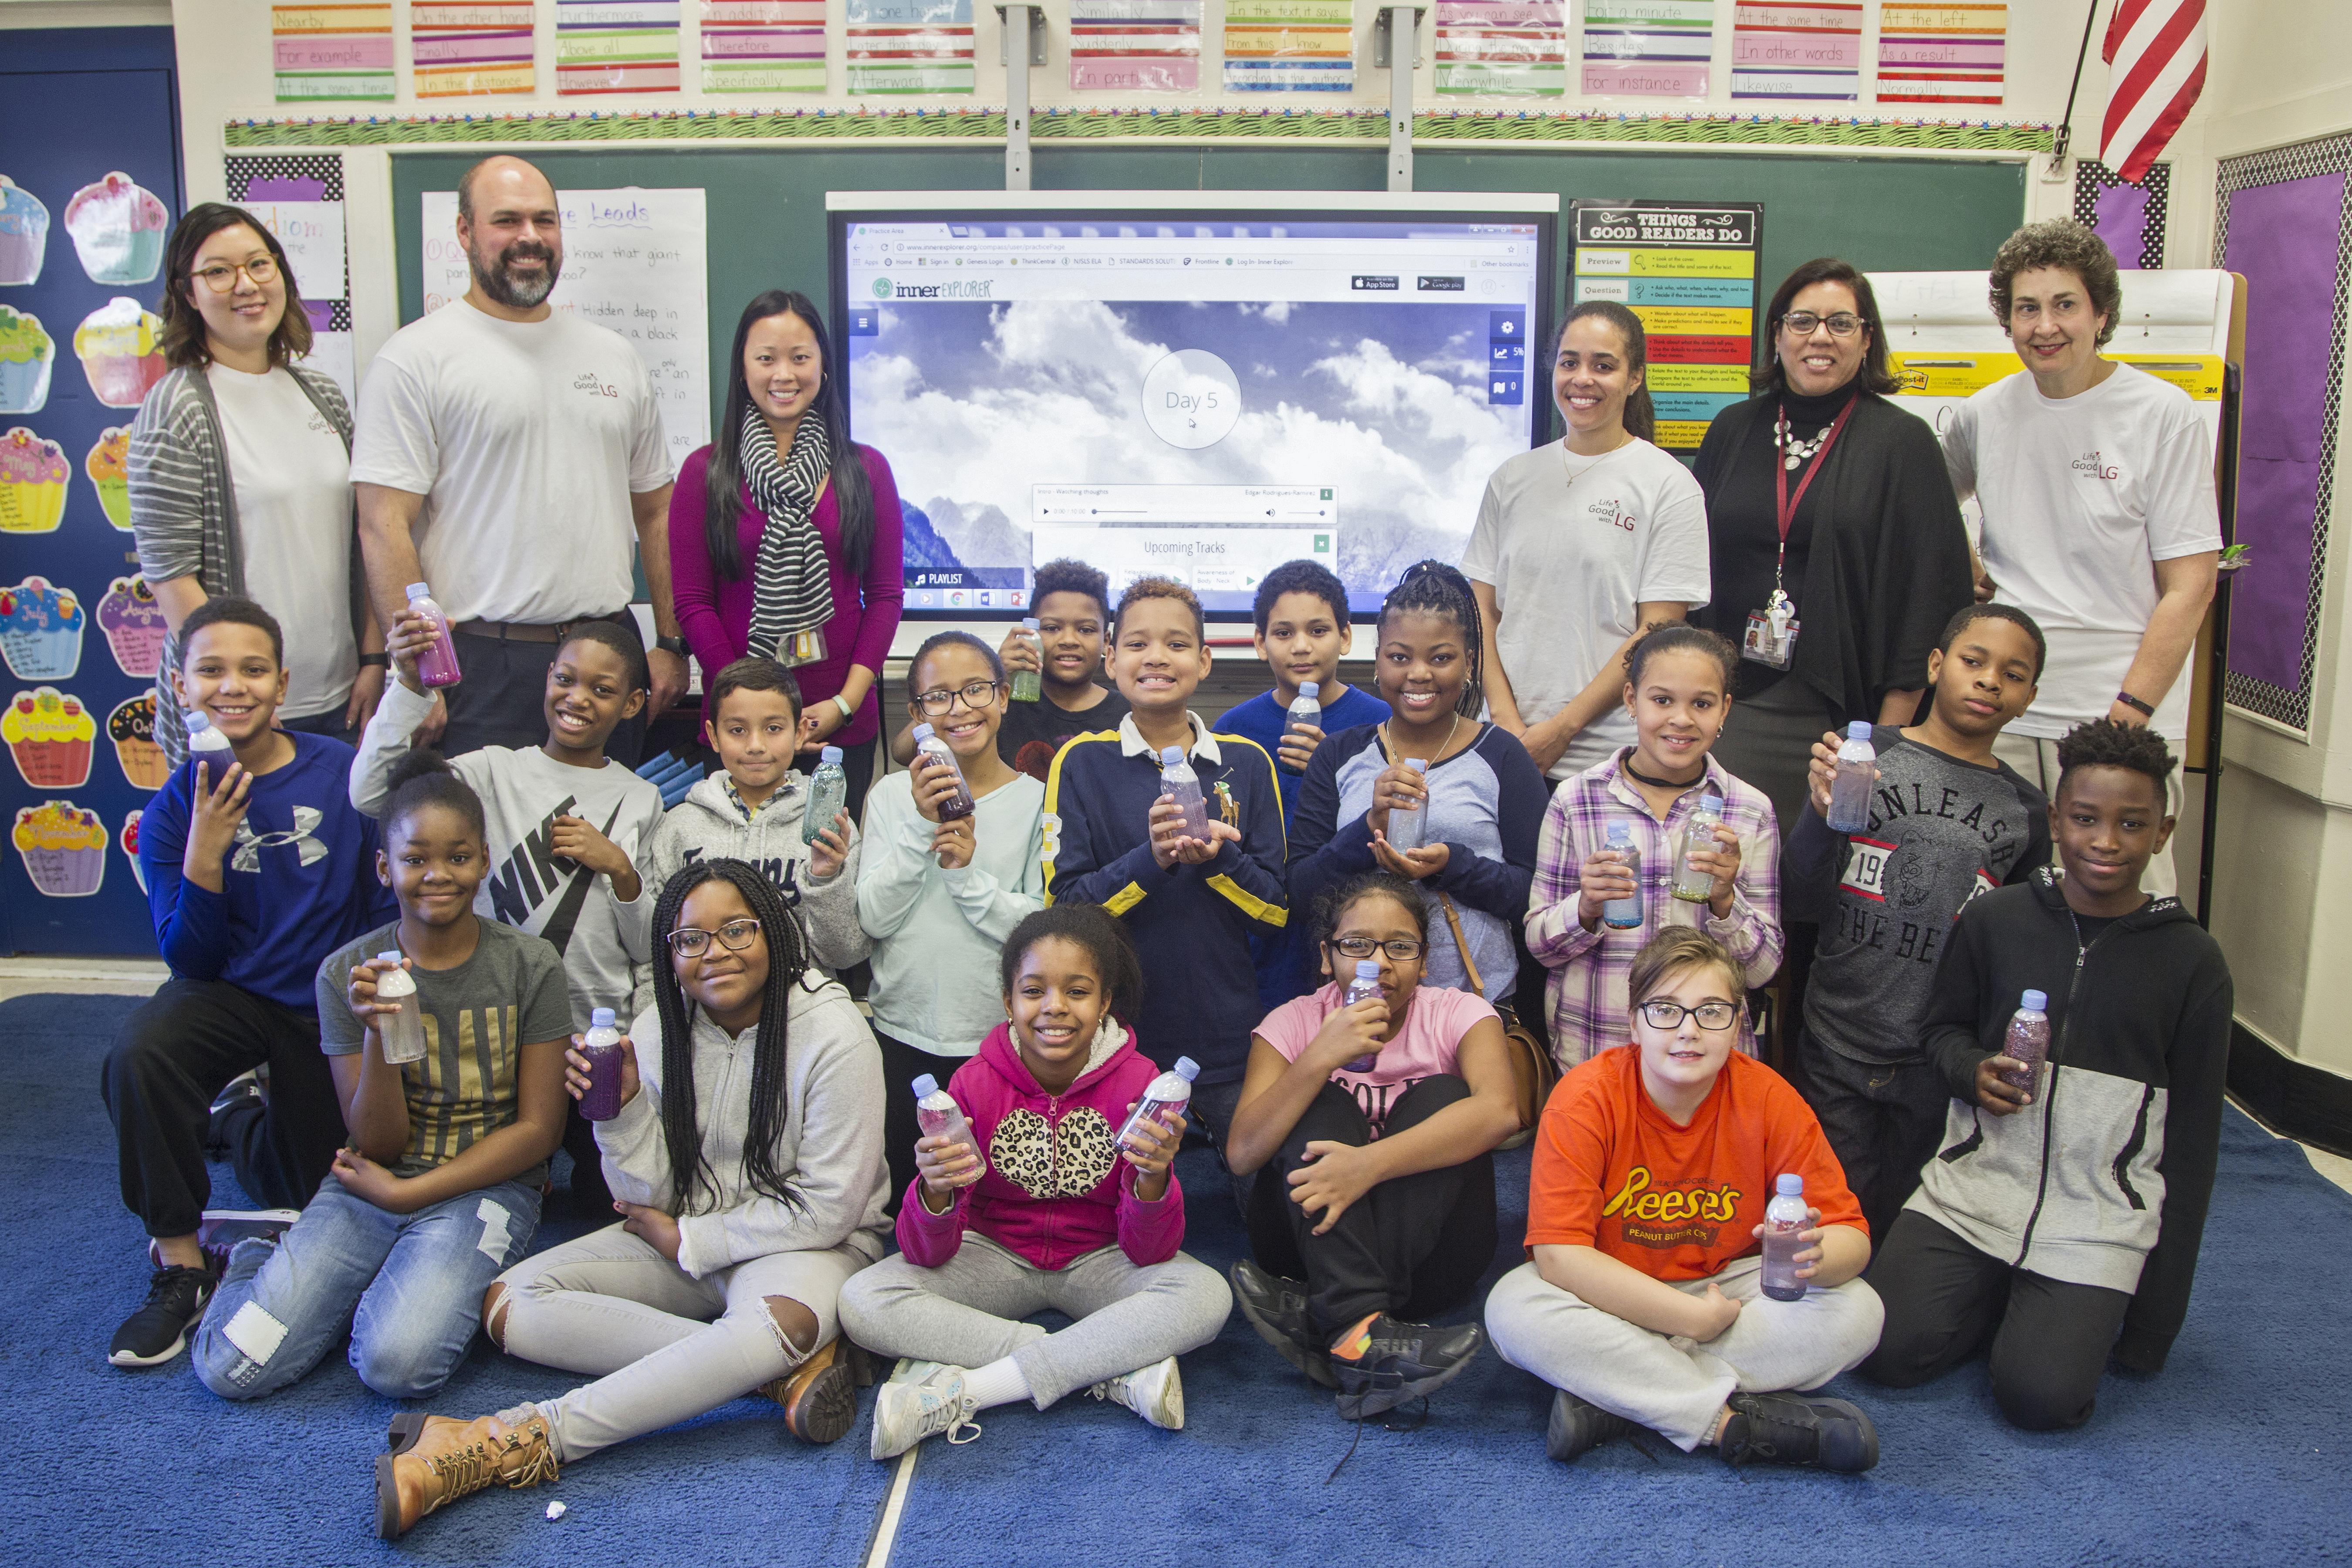 McCloud school students celebrate